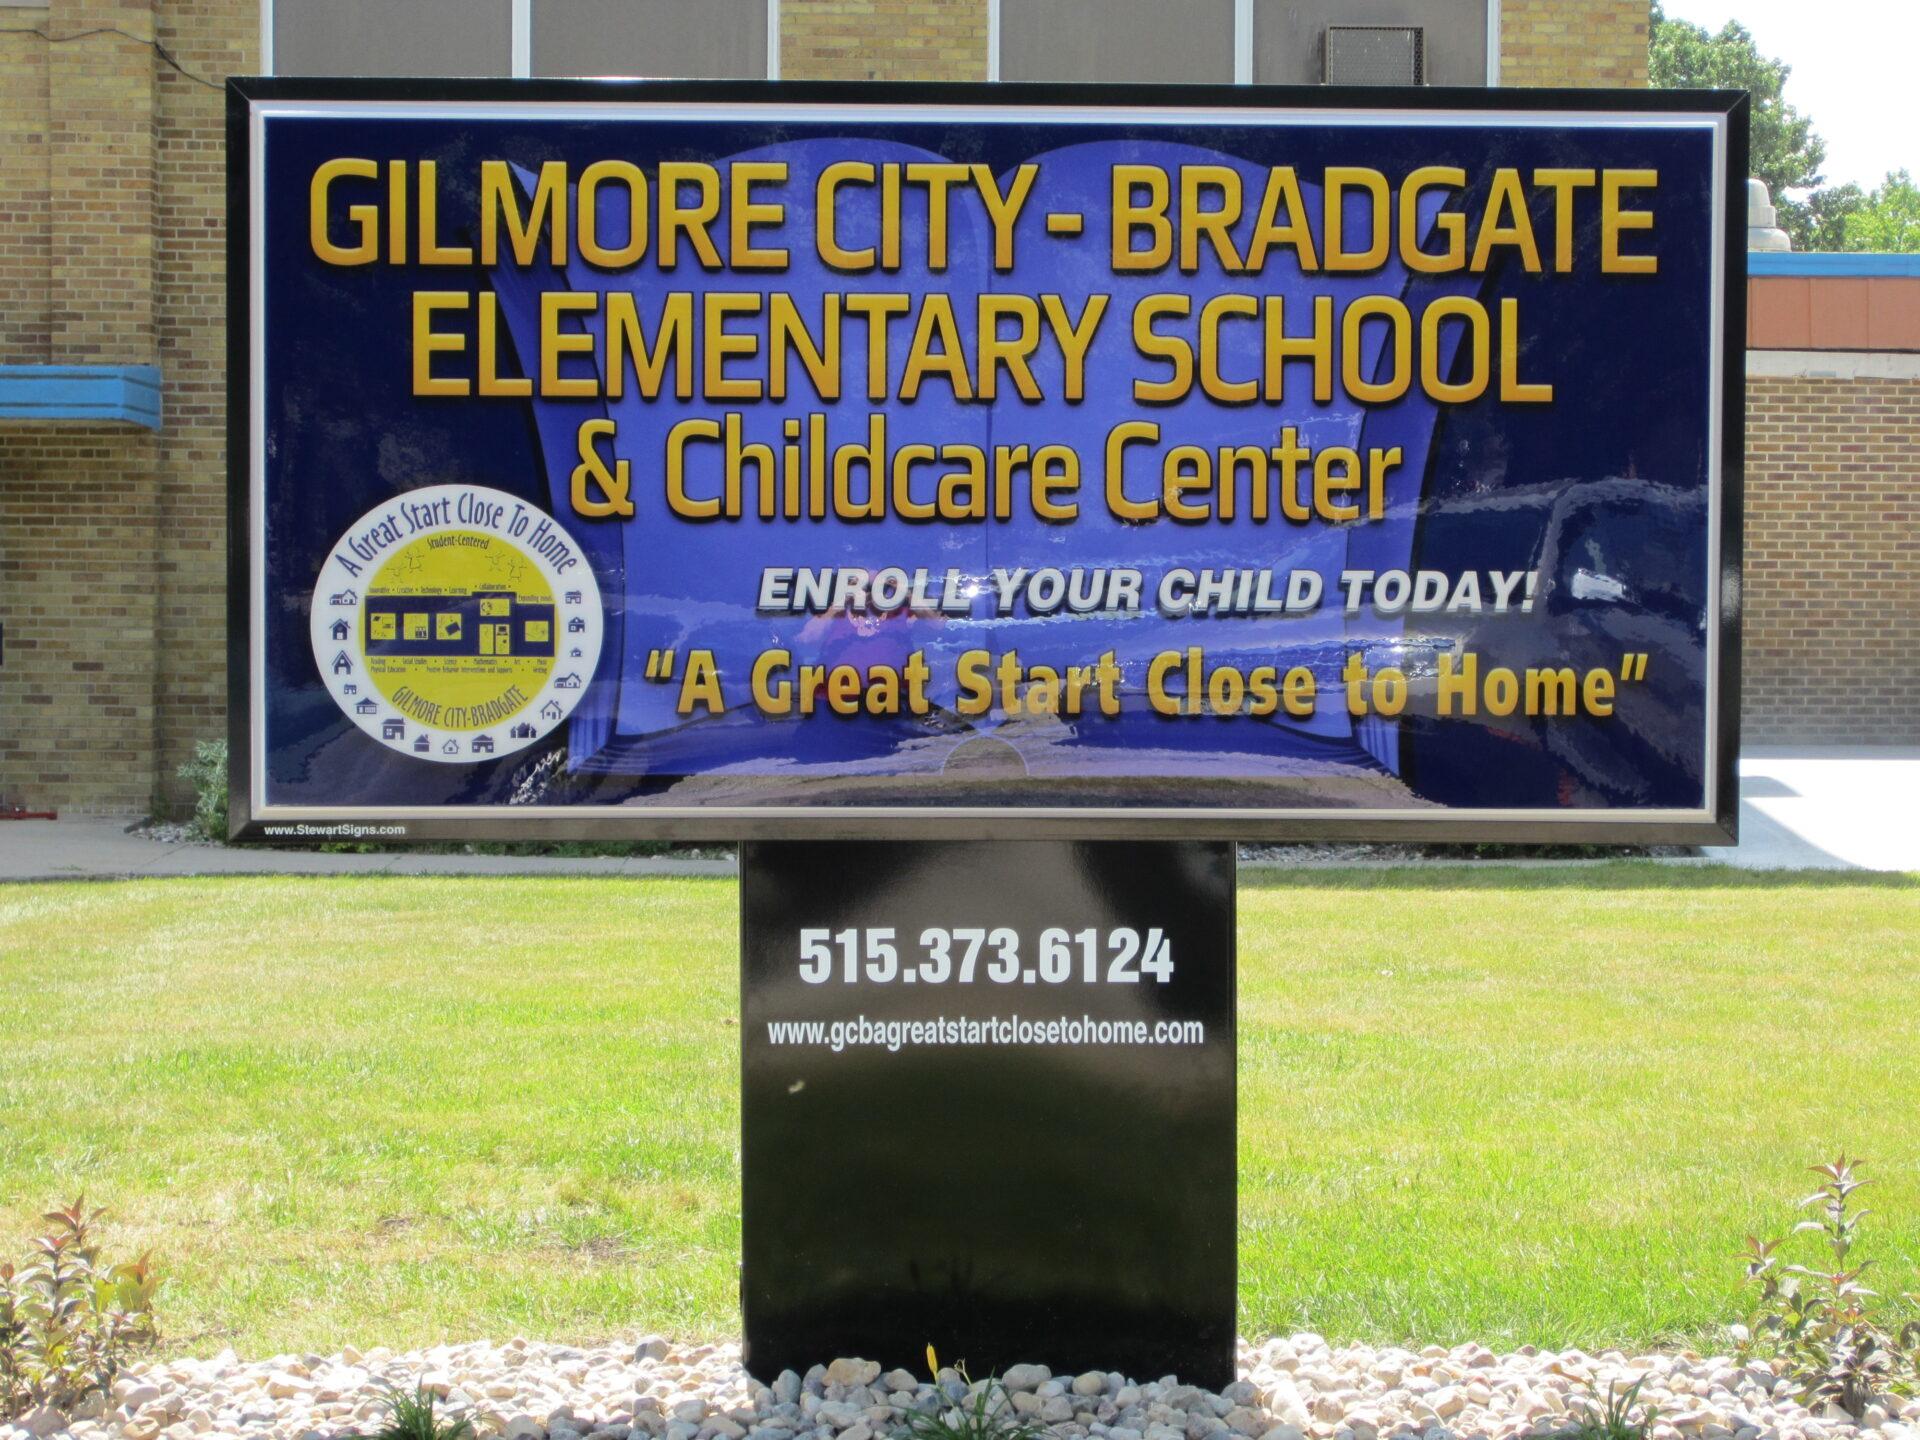 Gilmore City Elementary